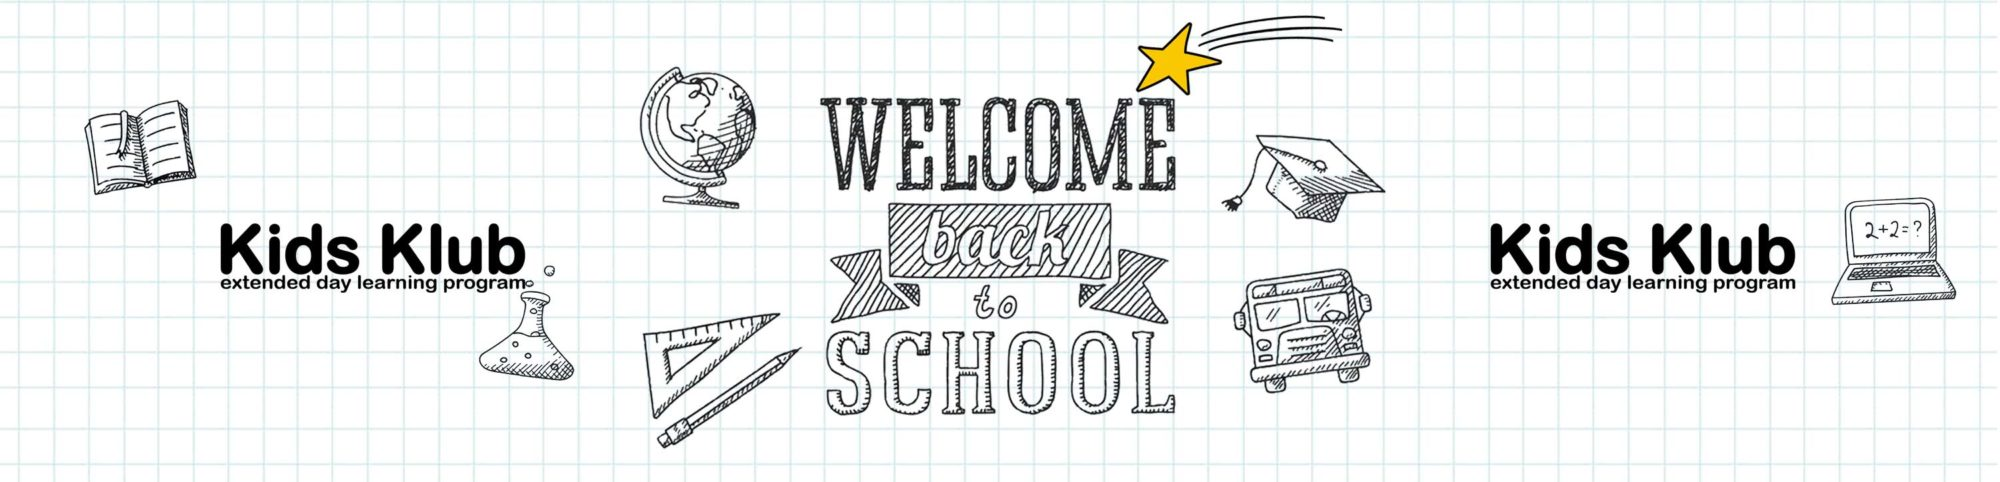 1st day of school – 2019 start dates